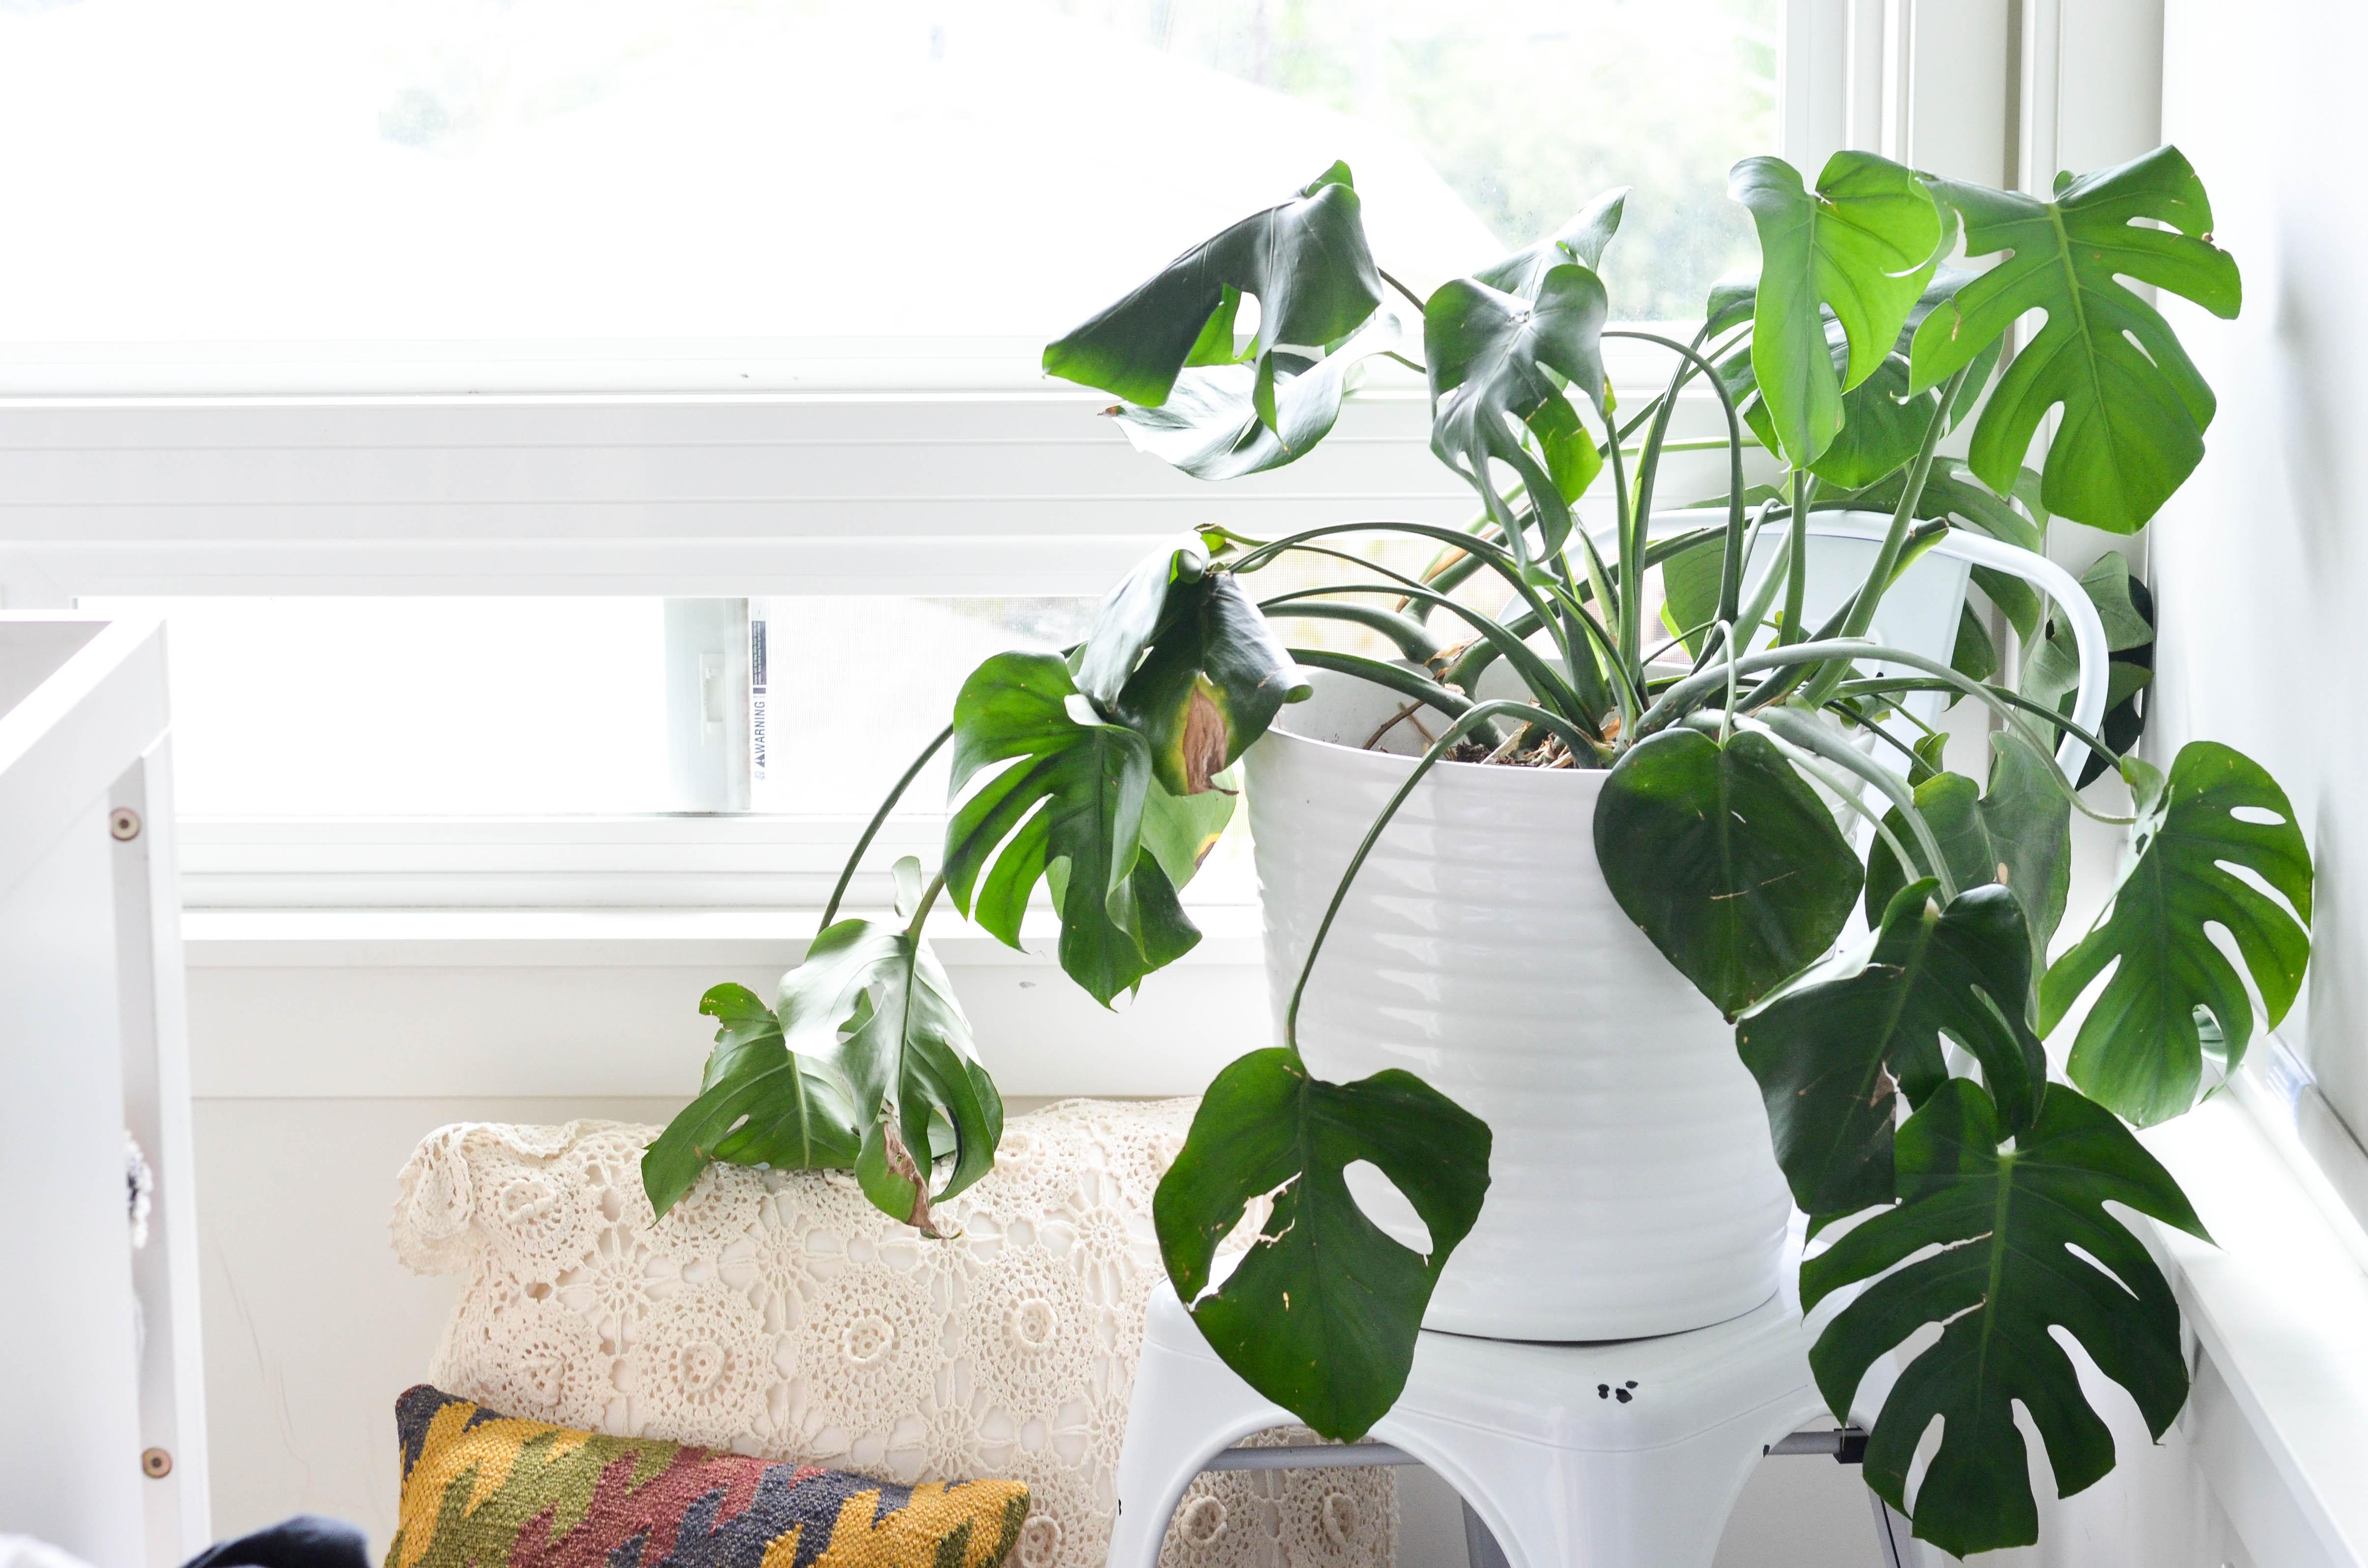 The Psychology Of a Joyful Home